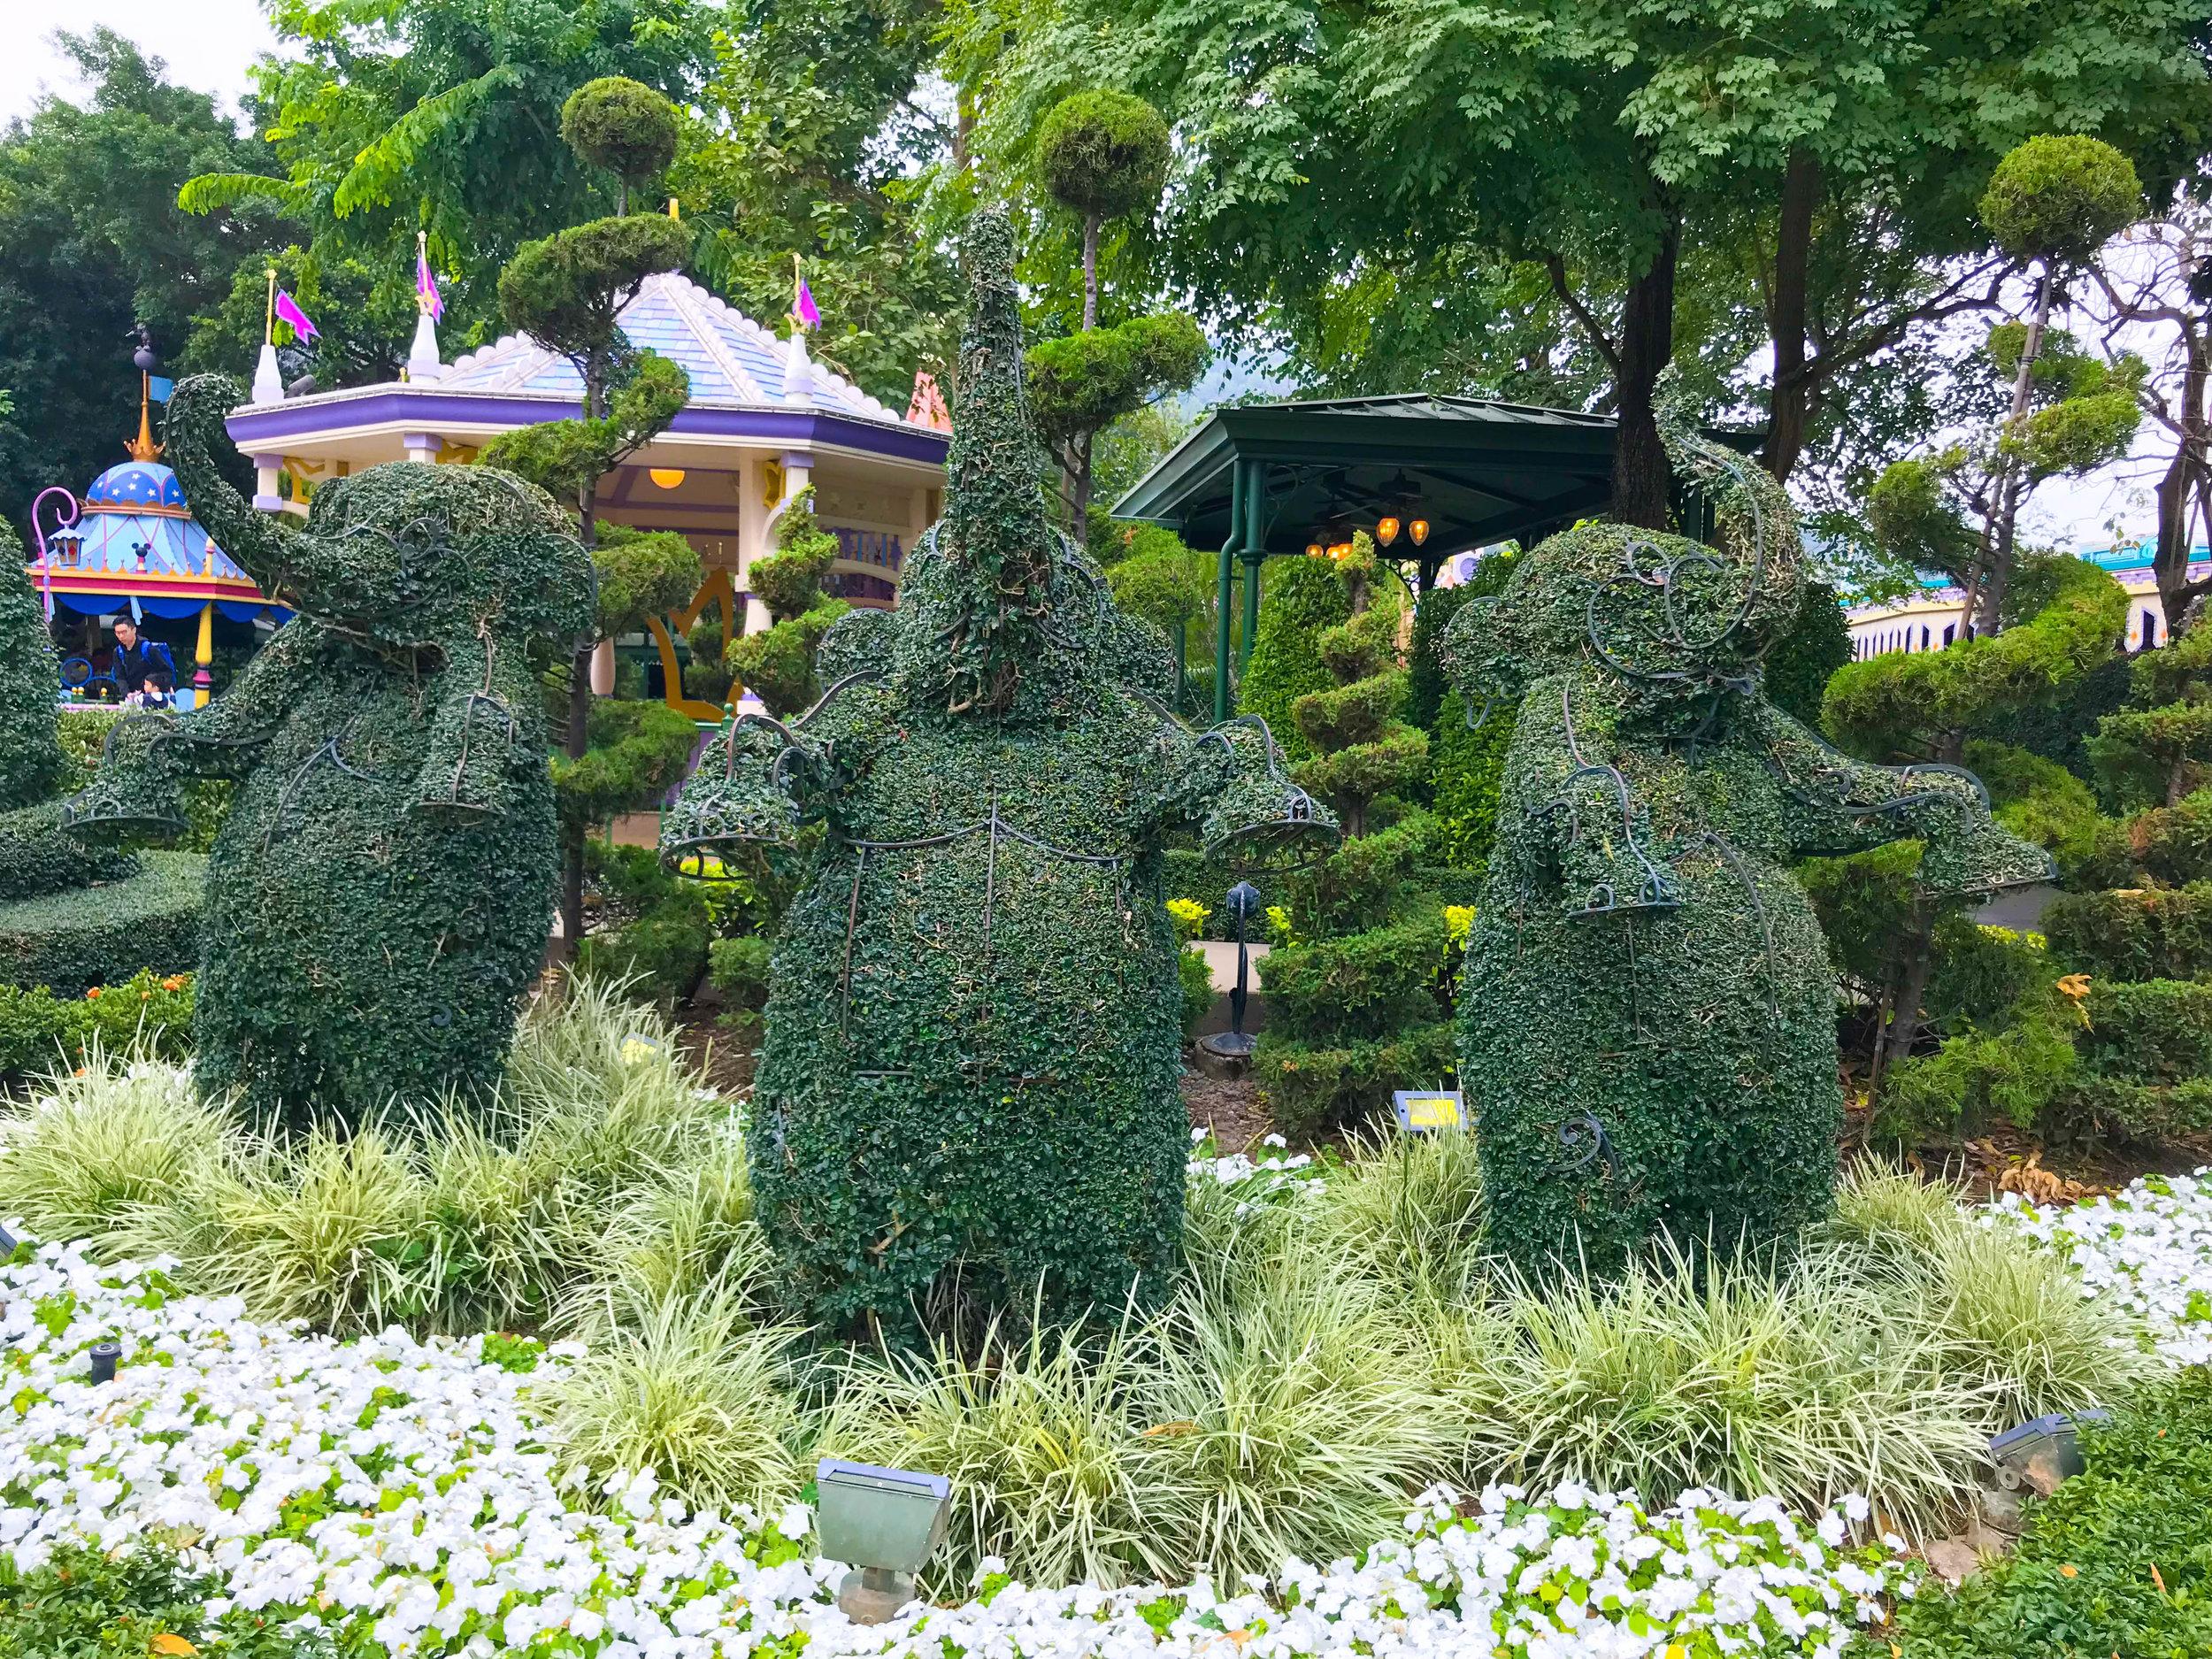 Hong Kong Disneyland - Fantasia Garden